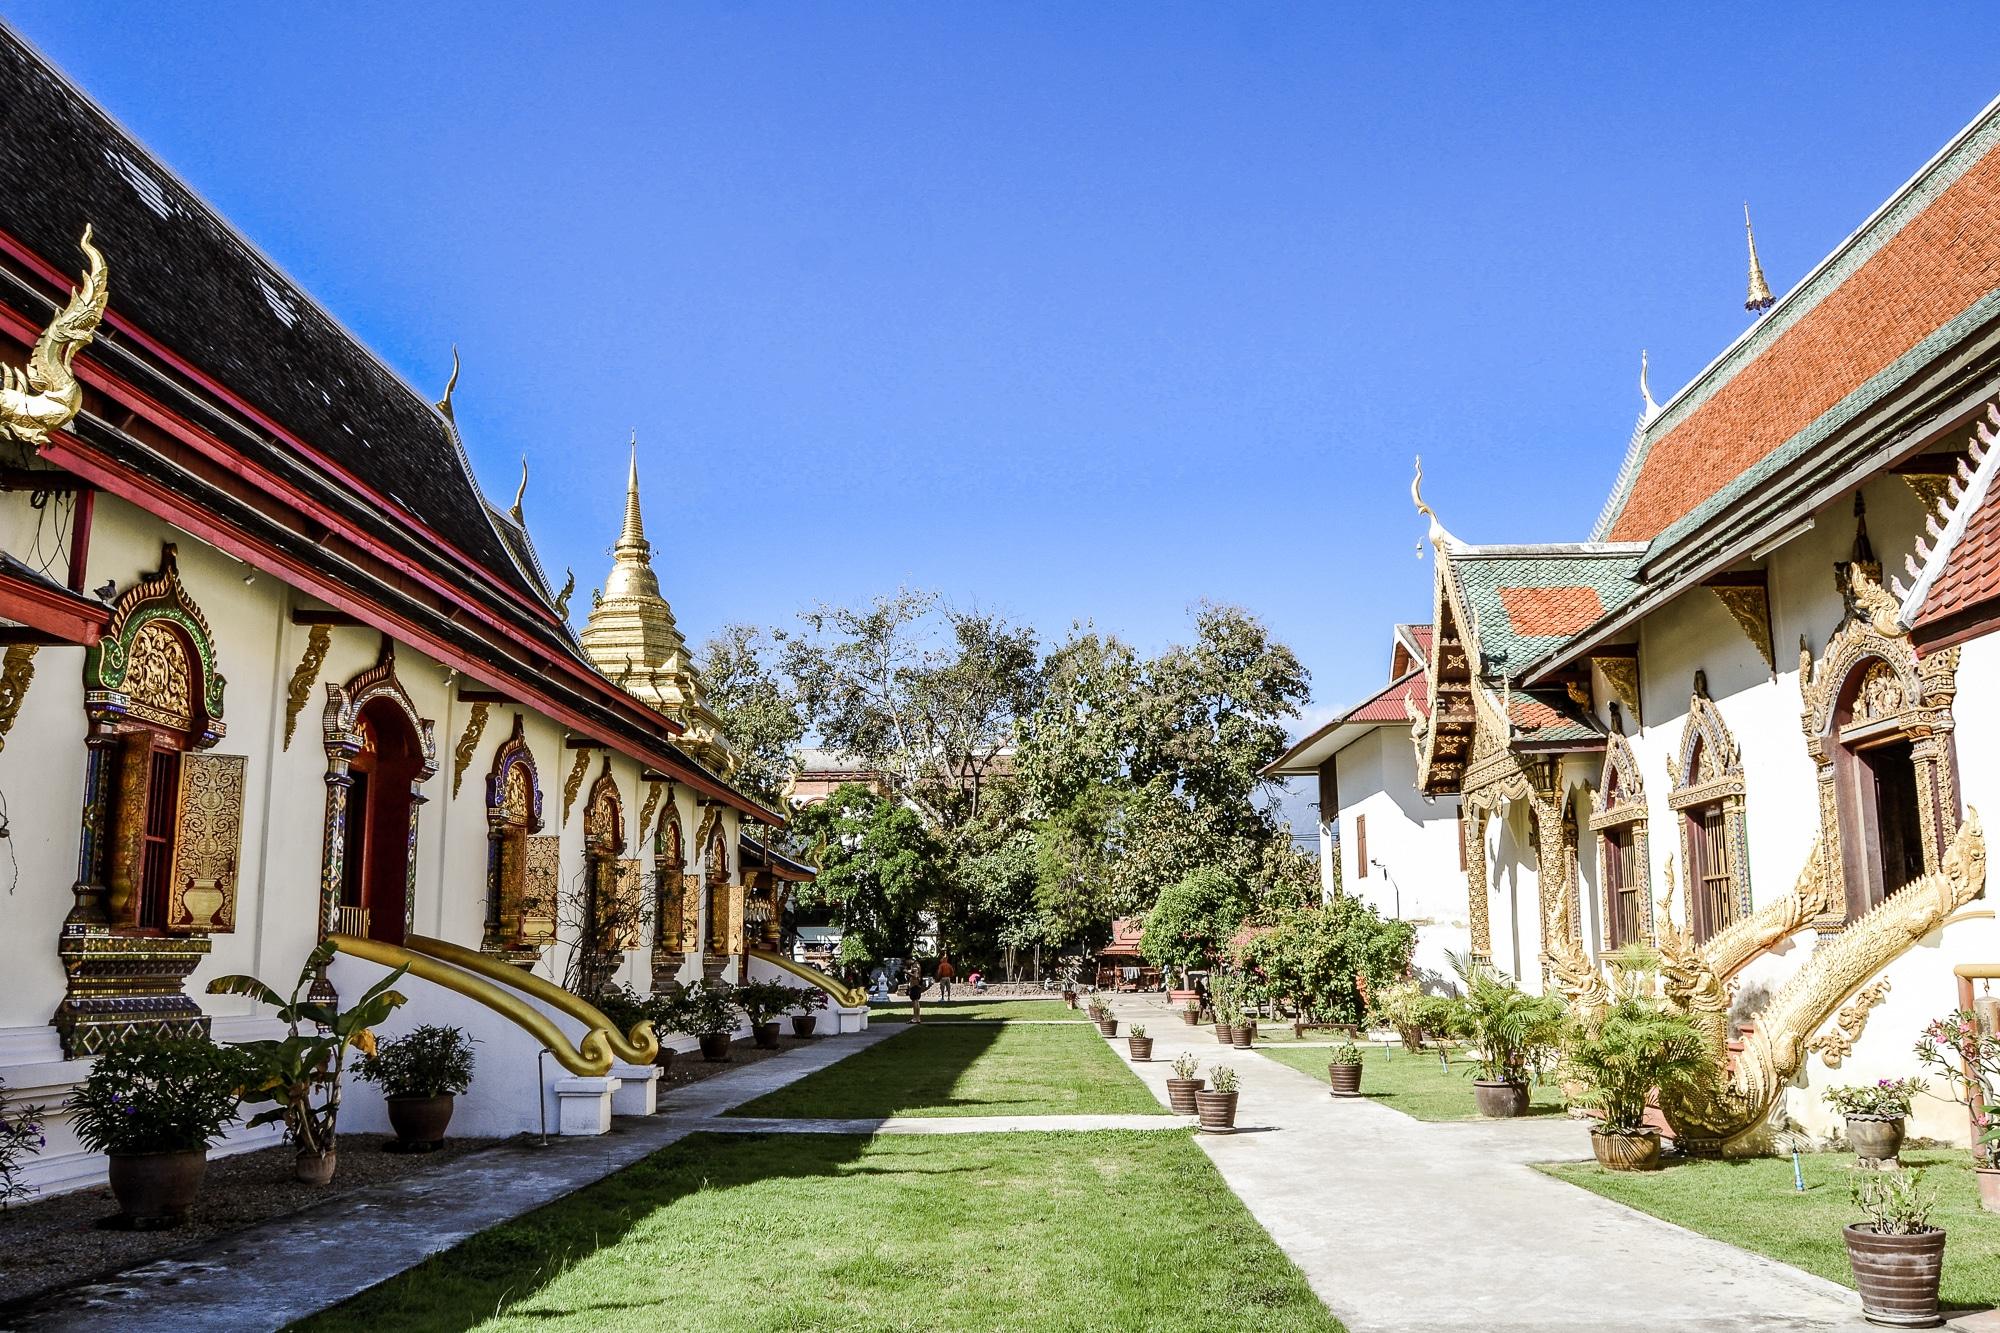 Food Märkte in Chiang Mai: Wo ist der beste Food Markt (Food Court)?